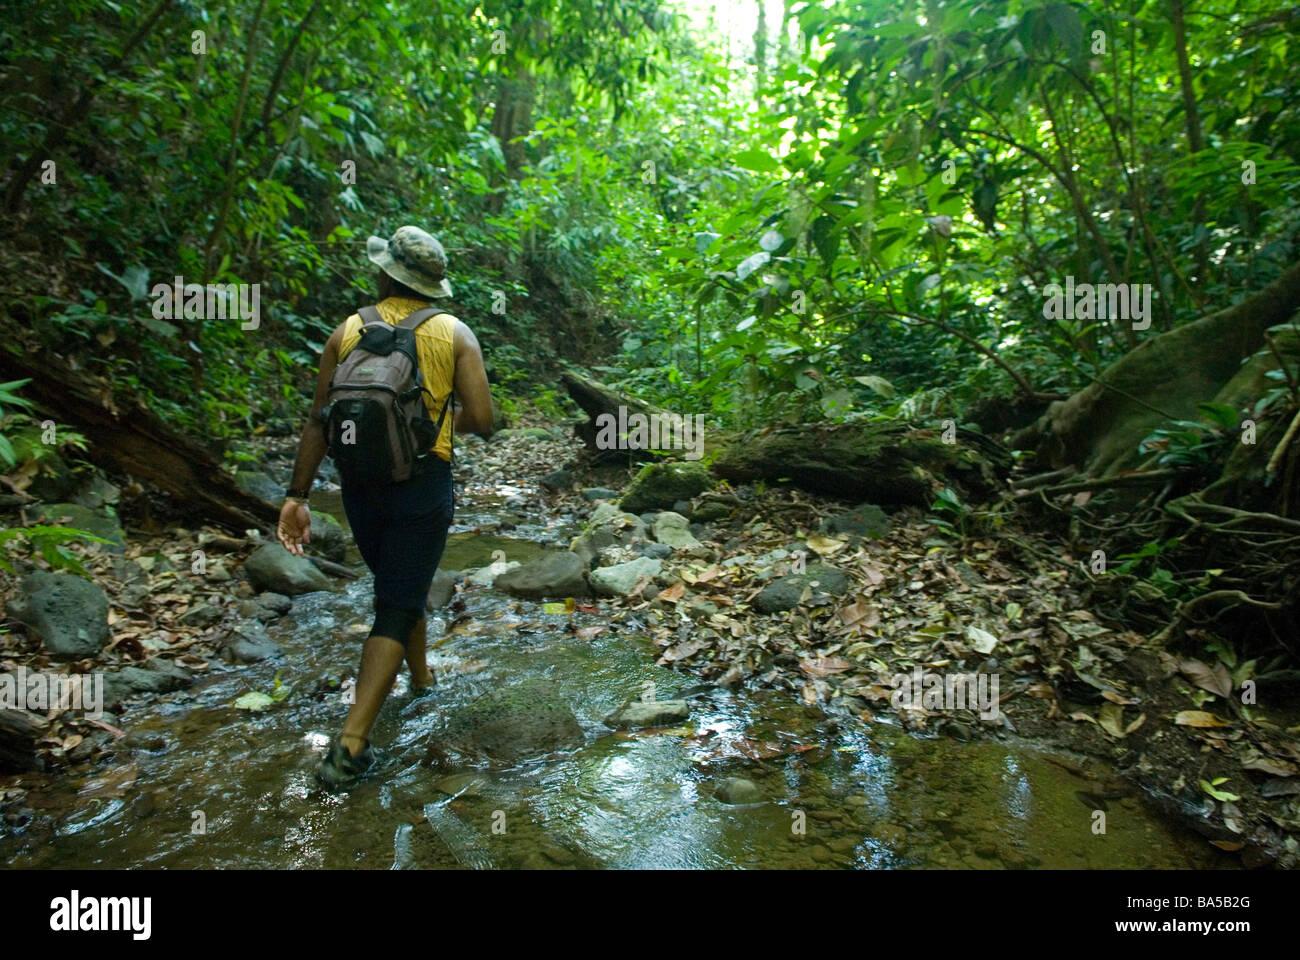 A big cat researcher patrols Corcovado National Park - Stock Image